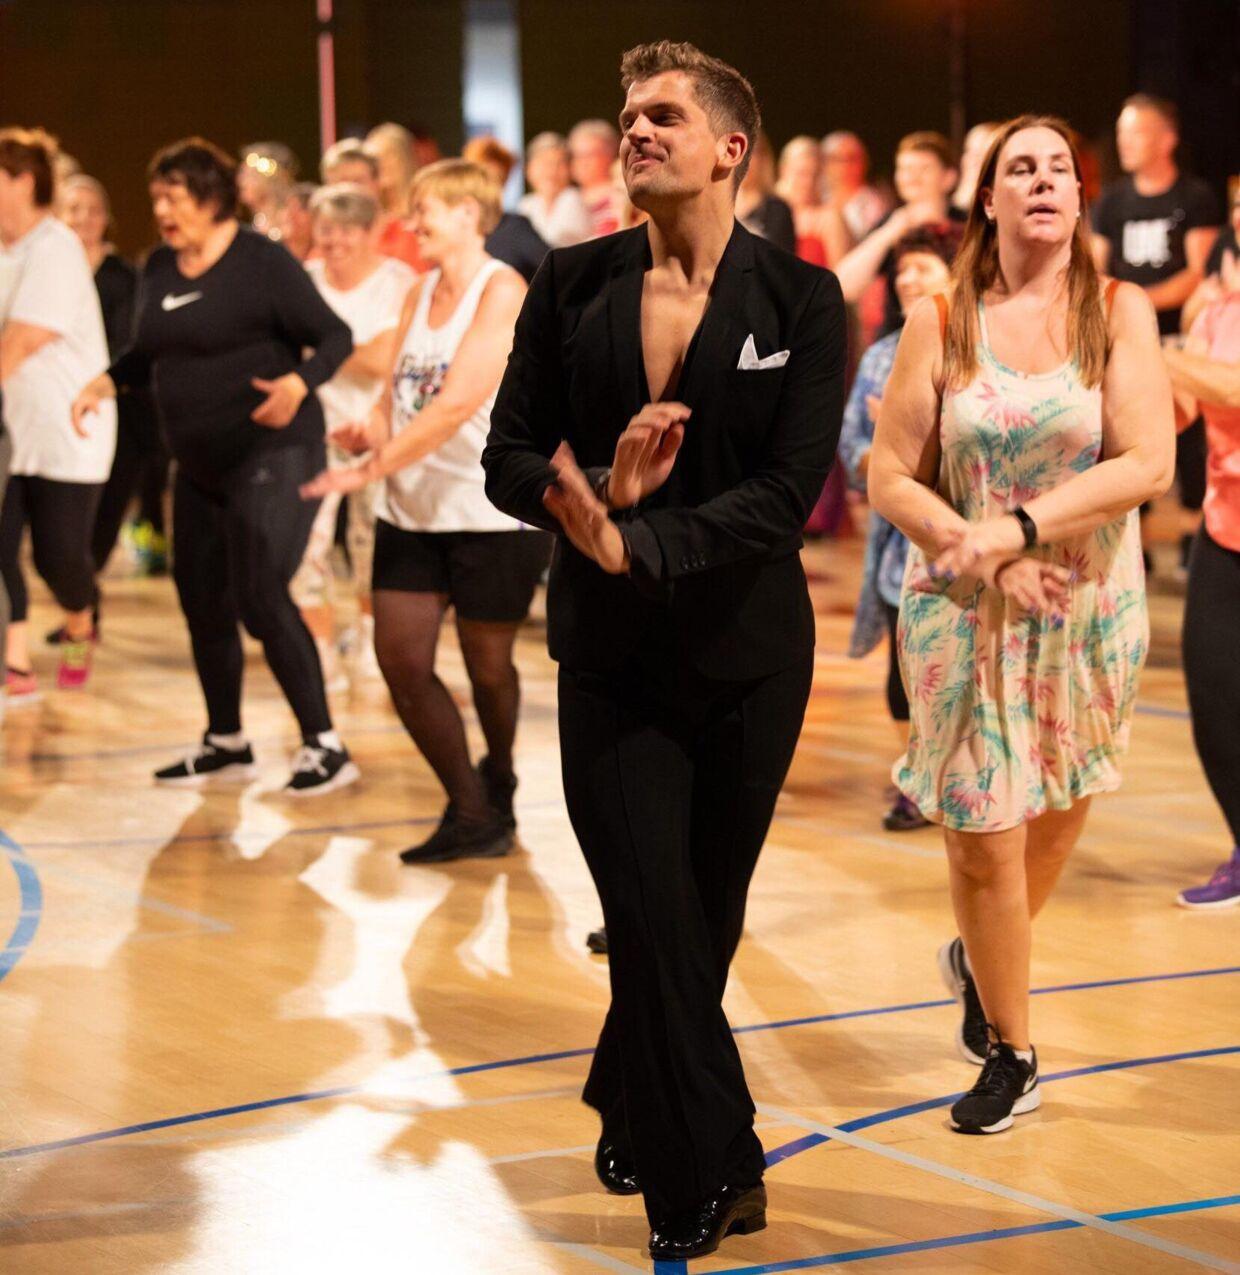 Her kan du se Henrik i action på dansegulvet.